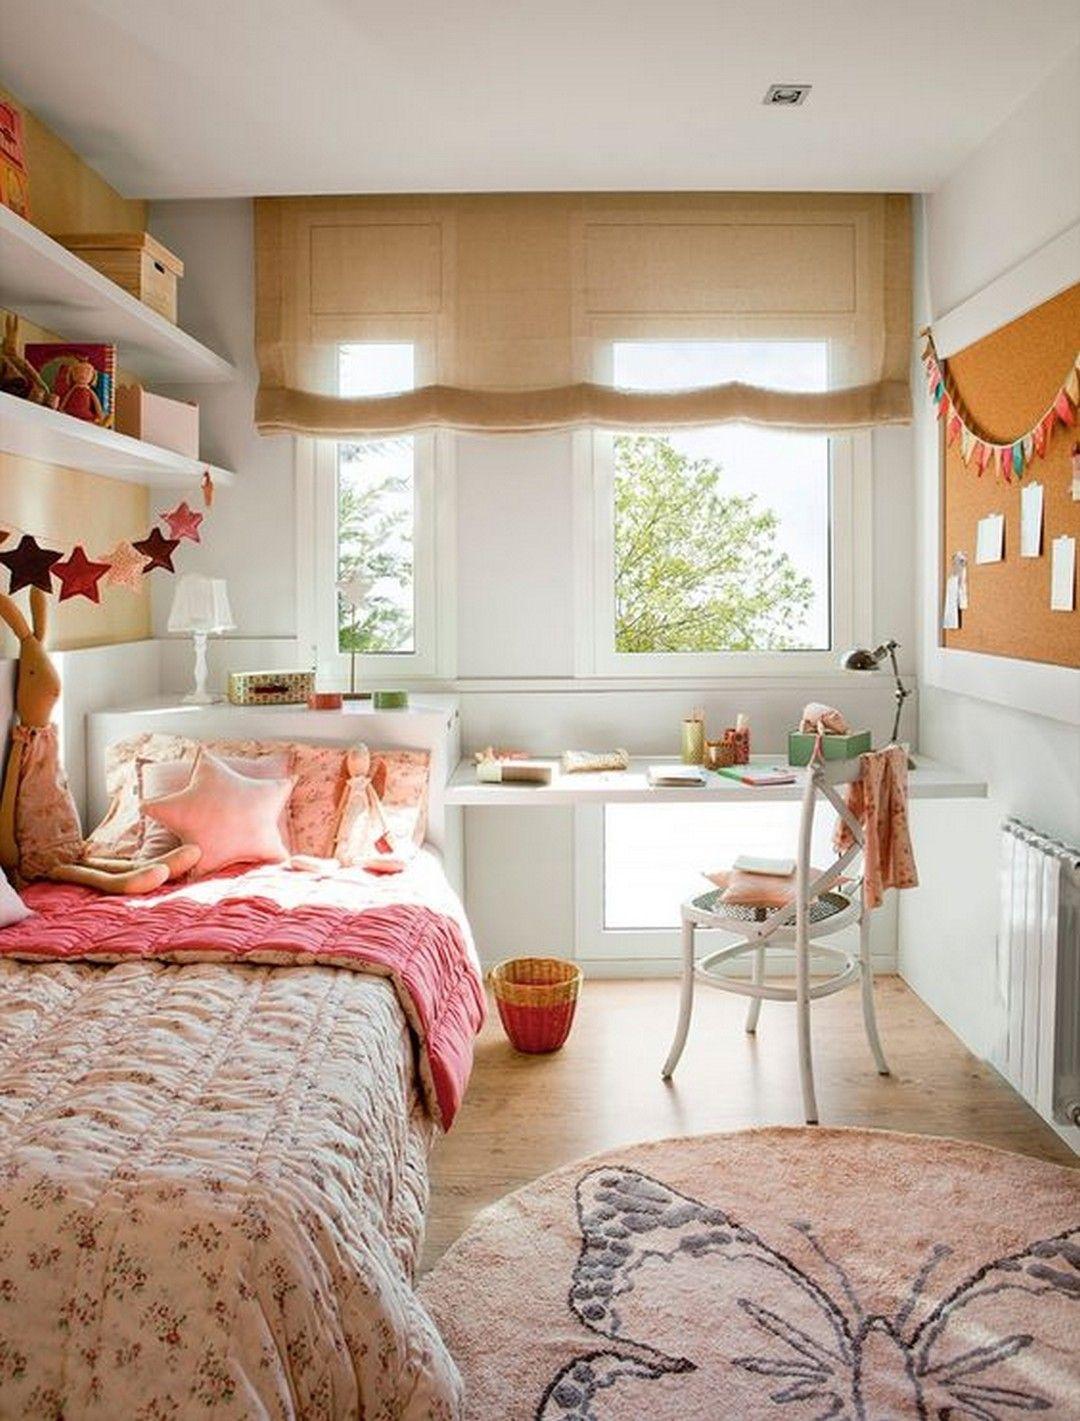 bedroom, wooden floor, white wall, brown shade, white built in table, white shelves, pink bedding, white chair